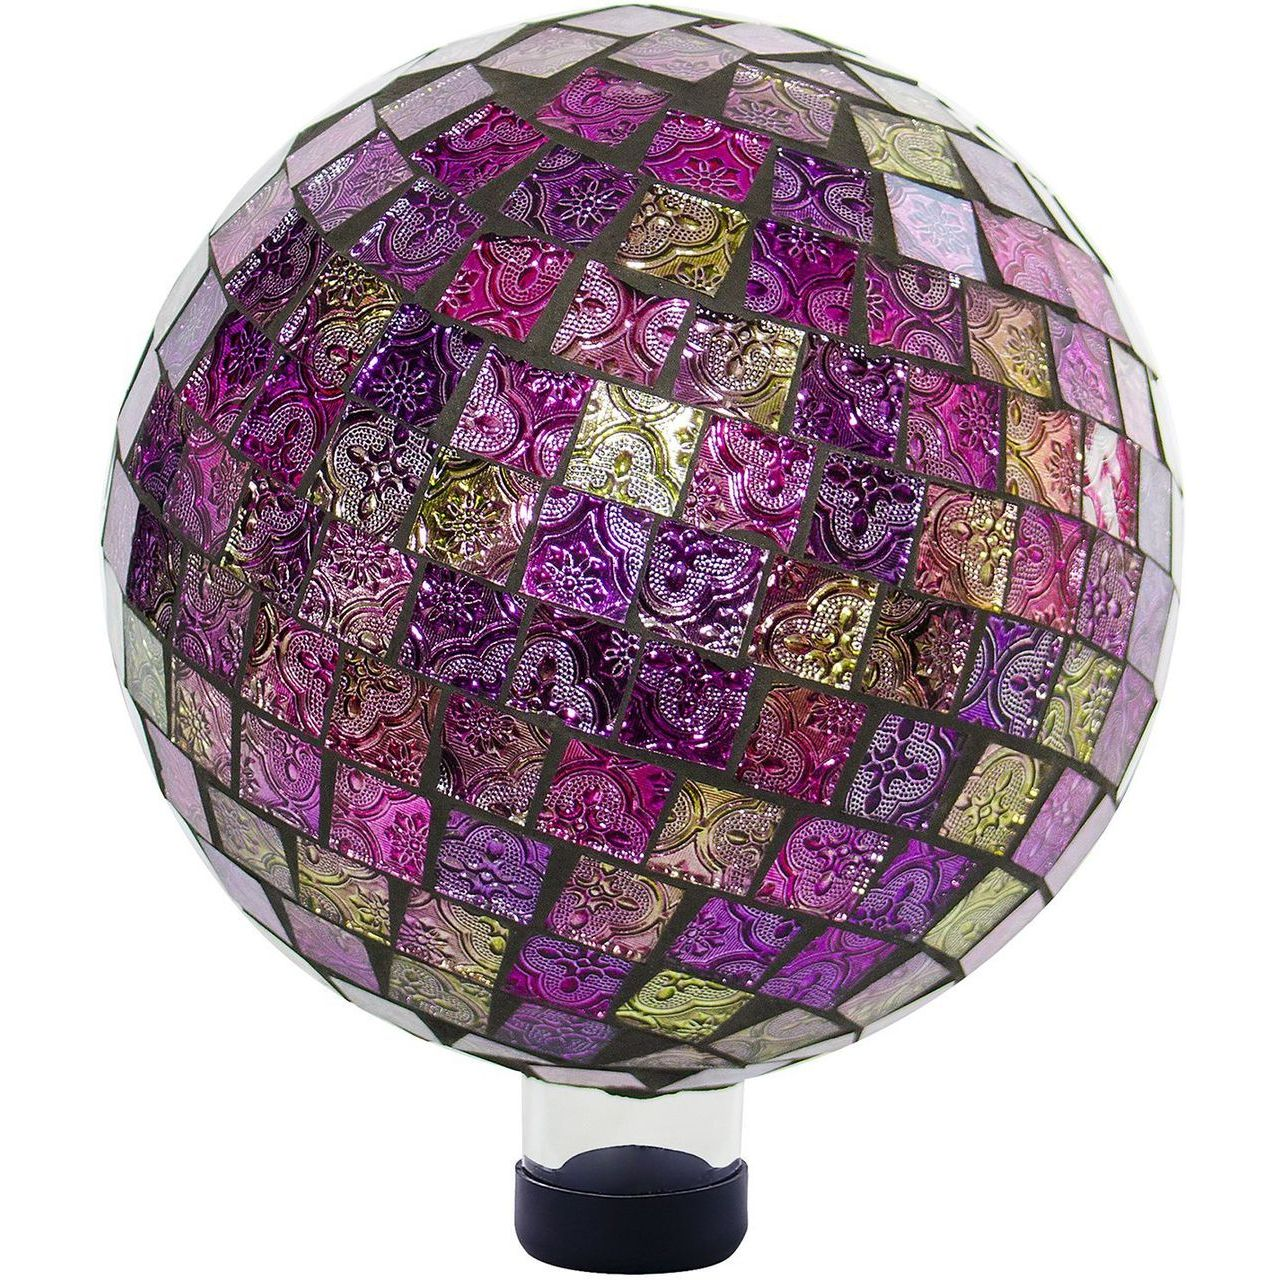 Alpine HGY302 Mosaic Pink Embossed Tile Pattern Gazing Globe